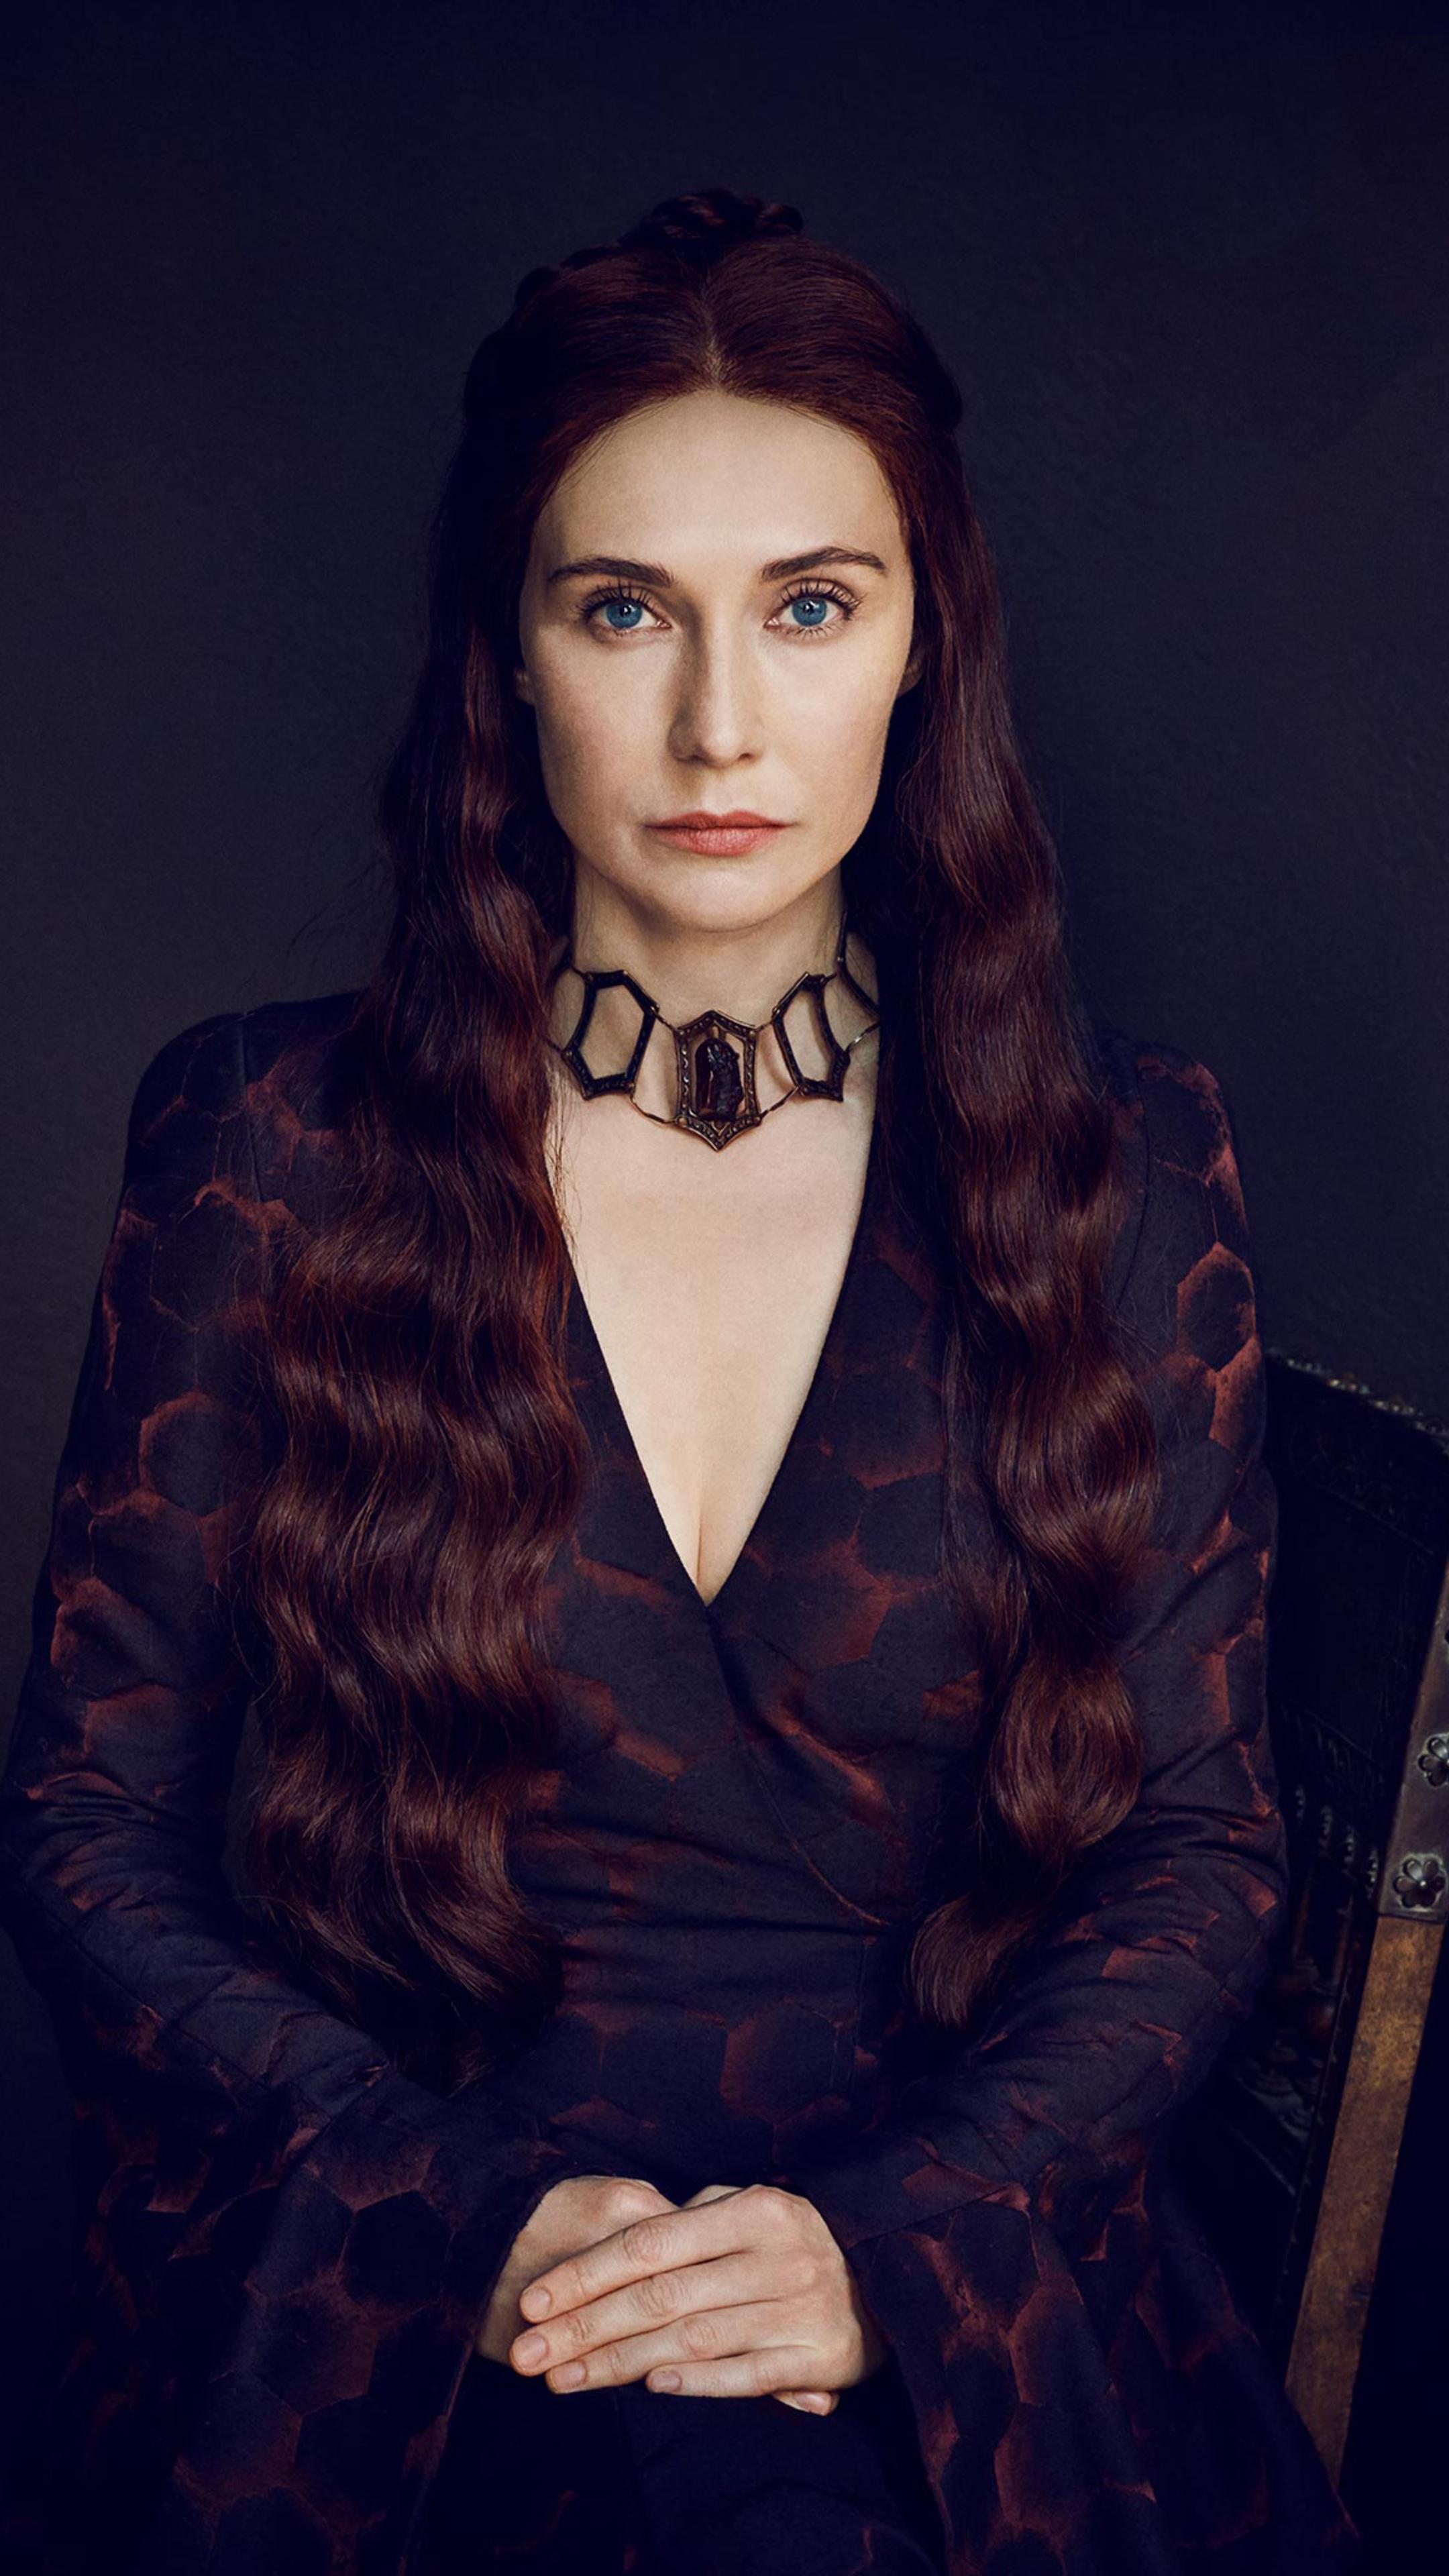 2160x3840 Melisandre Game Of Thrones Season 8 Sony Xperia